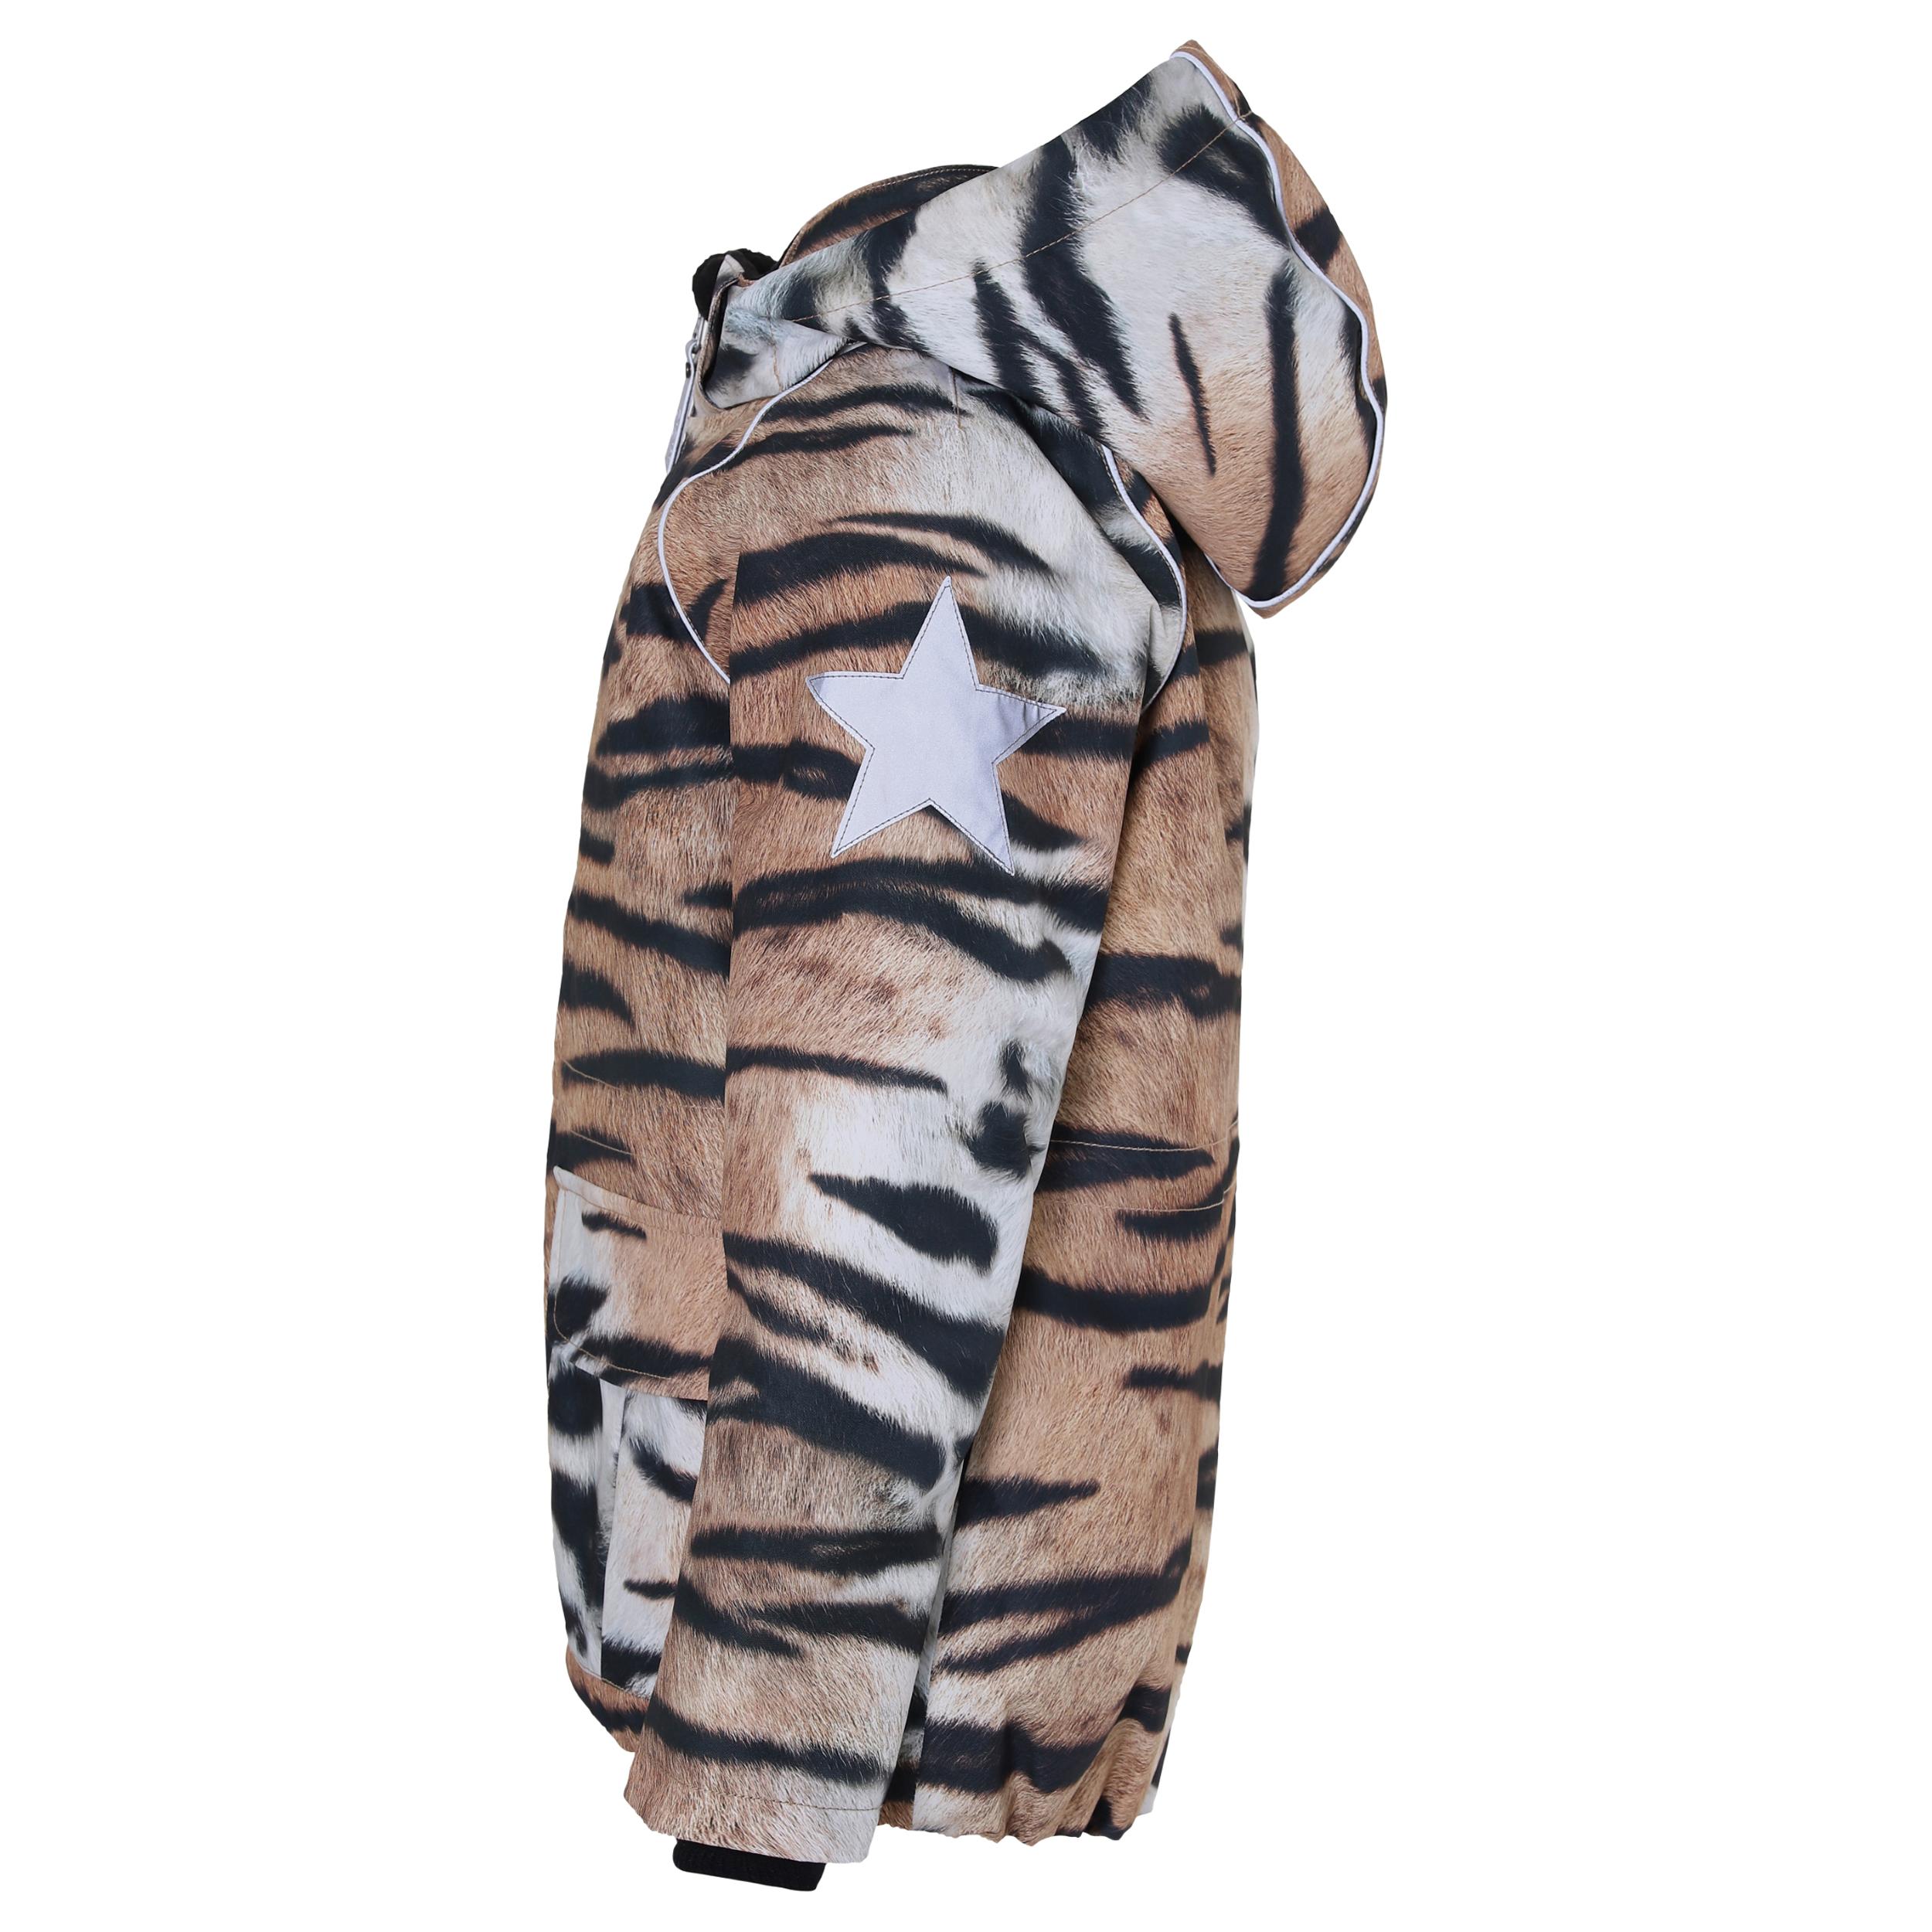 Toppatakki Molo Cathy Wild Tiger  OVH 169.00